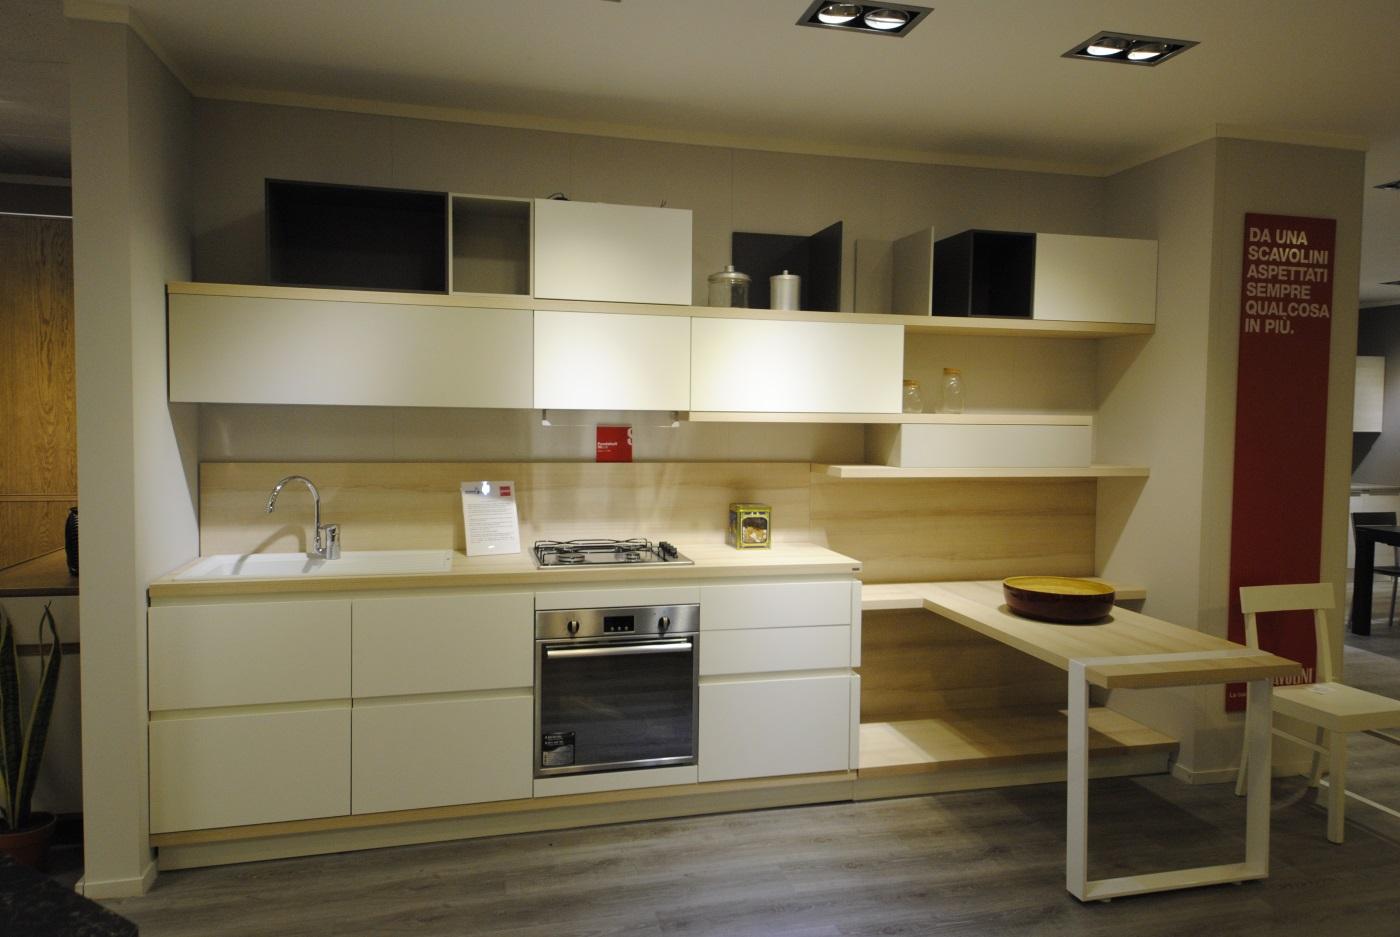 Offerta cucina scavolini modello foodshelf inside san for Cucina in offerta